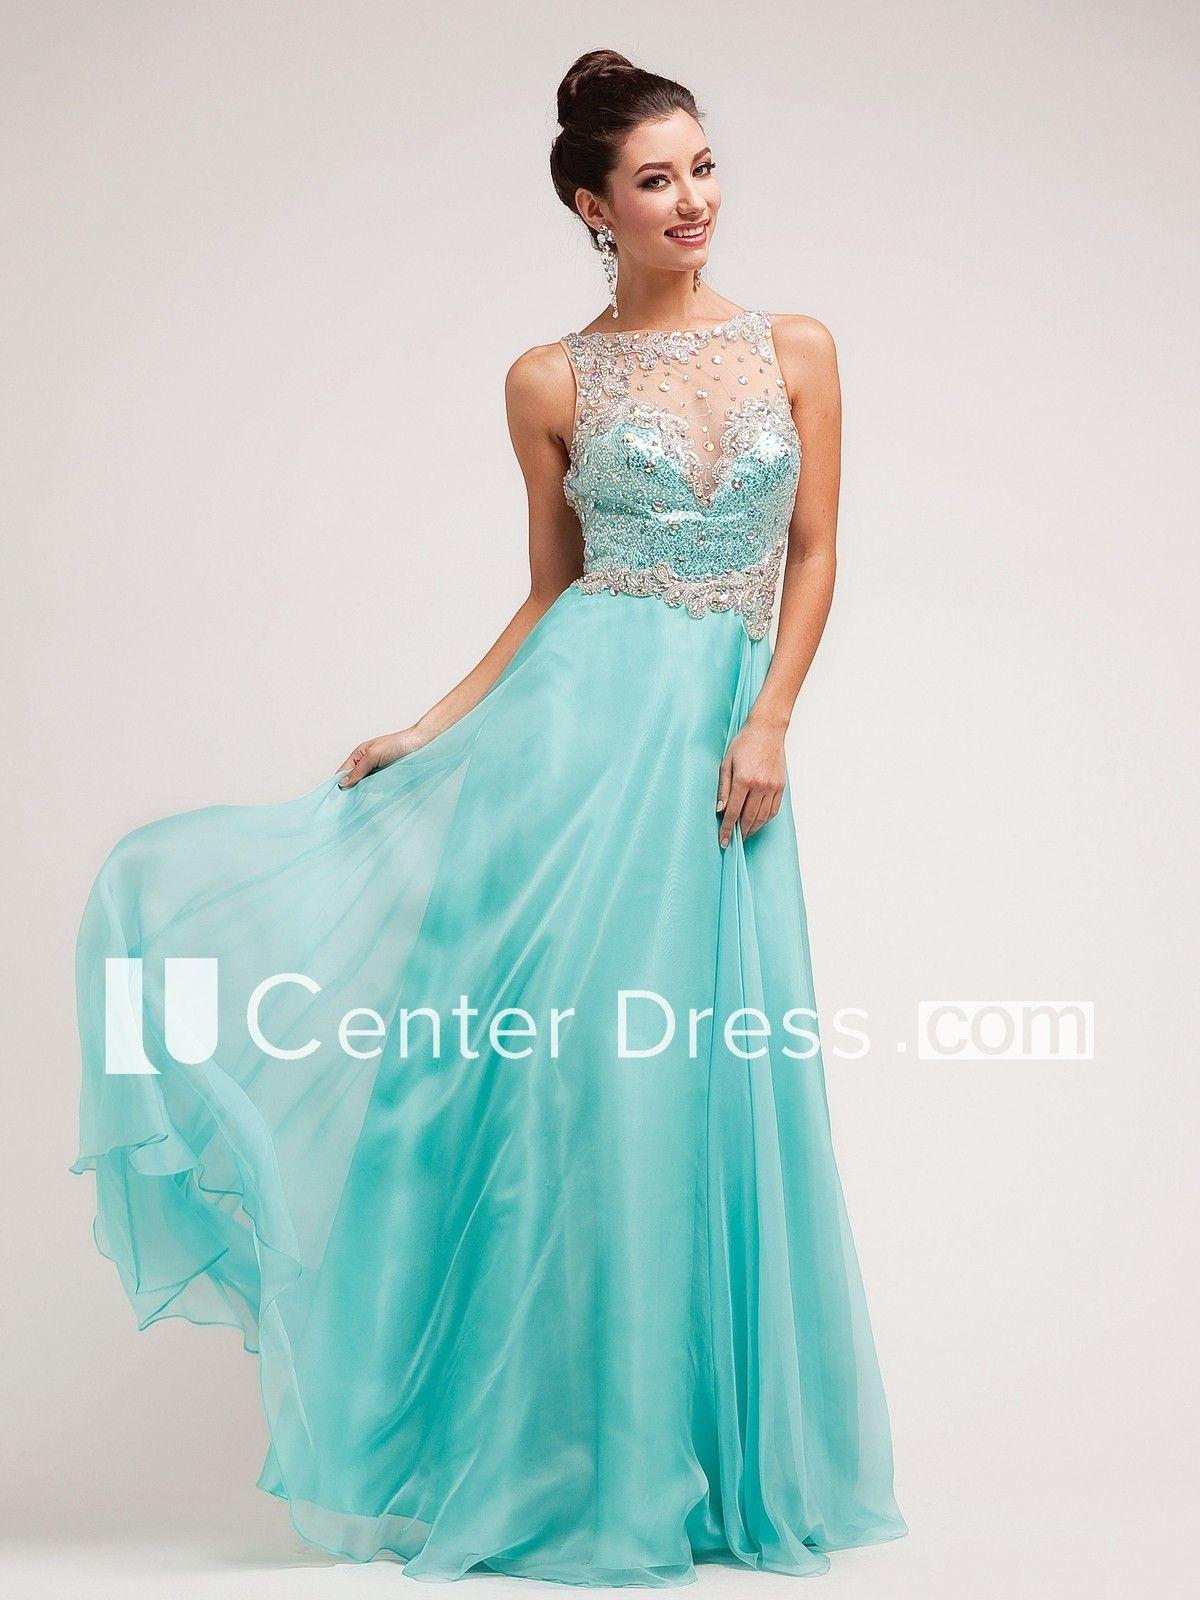 87b58750ed4 A-Line Bateau Sleeveless Satin Illusion Dress With Crystal Detailing ...